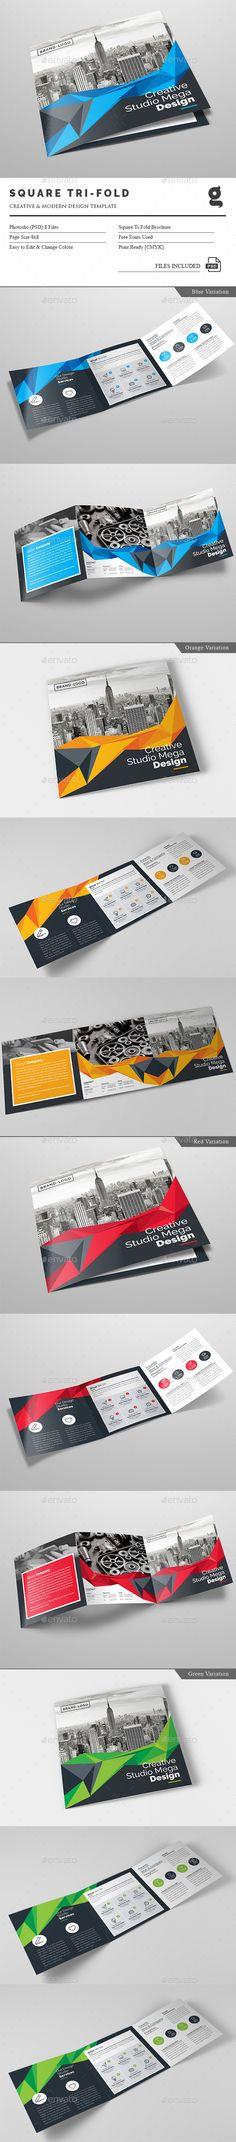 Square Tri-Fold Brochure Template PSD. Download here: http://graphicriver.net/item/square-trifold-brochure/15527434?ref=ksioks